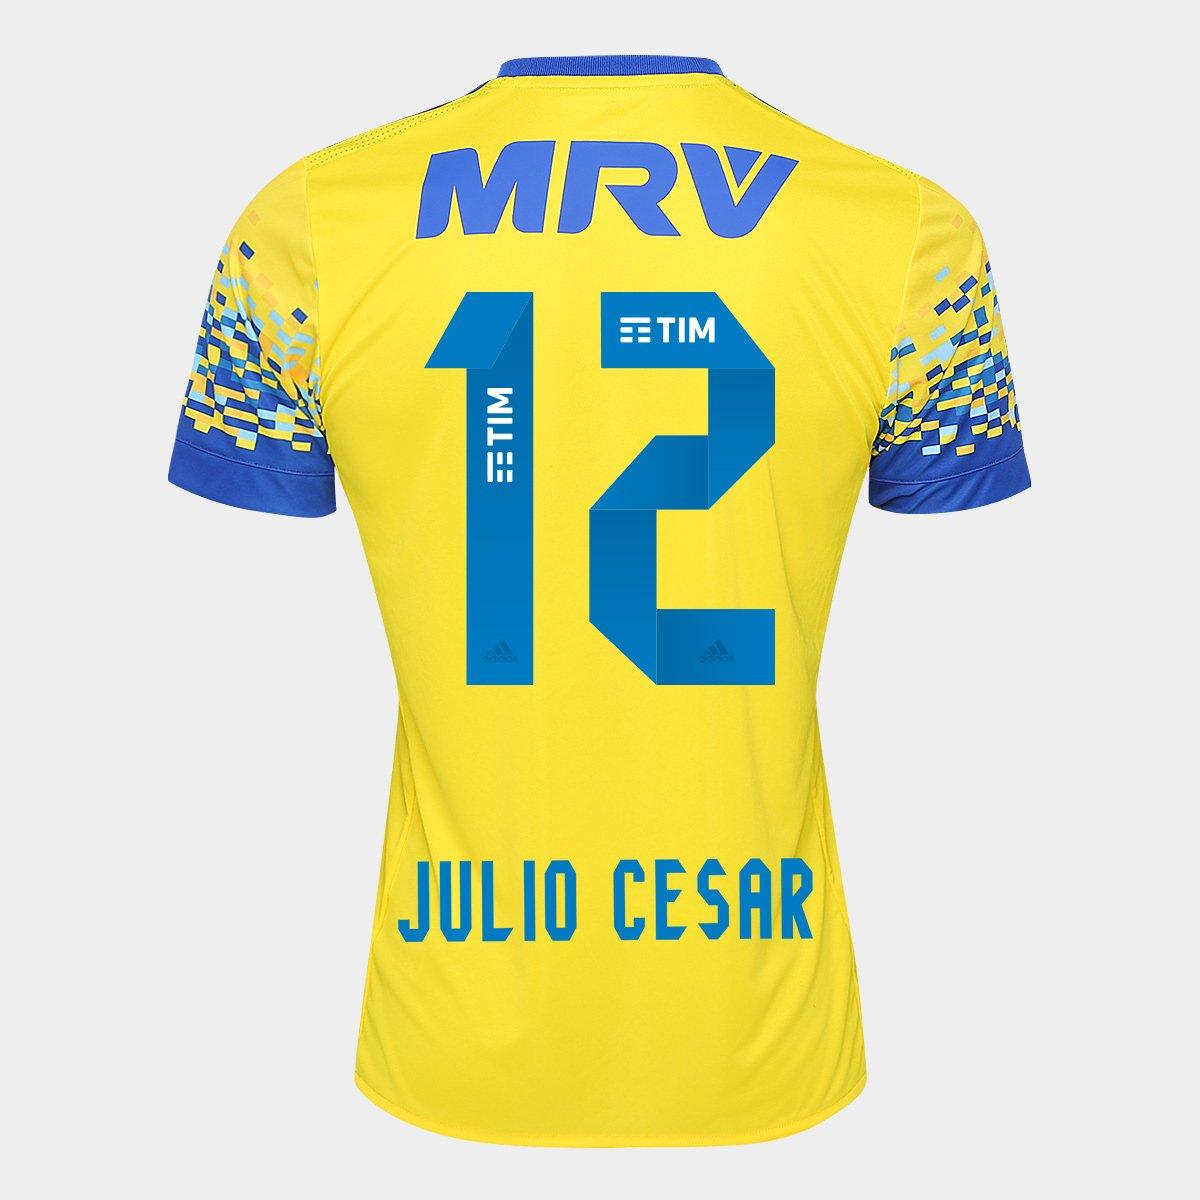 daade49f1a196 Camisa Flamengo II 17 18 N° 12 Júlio César Torcedor Adidas Masculina -  Compre Agora